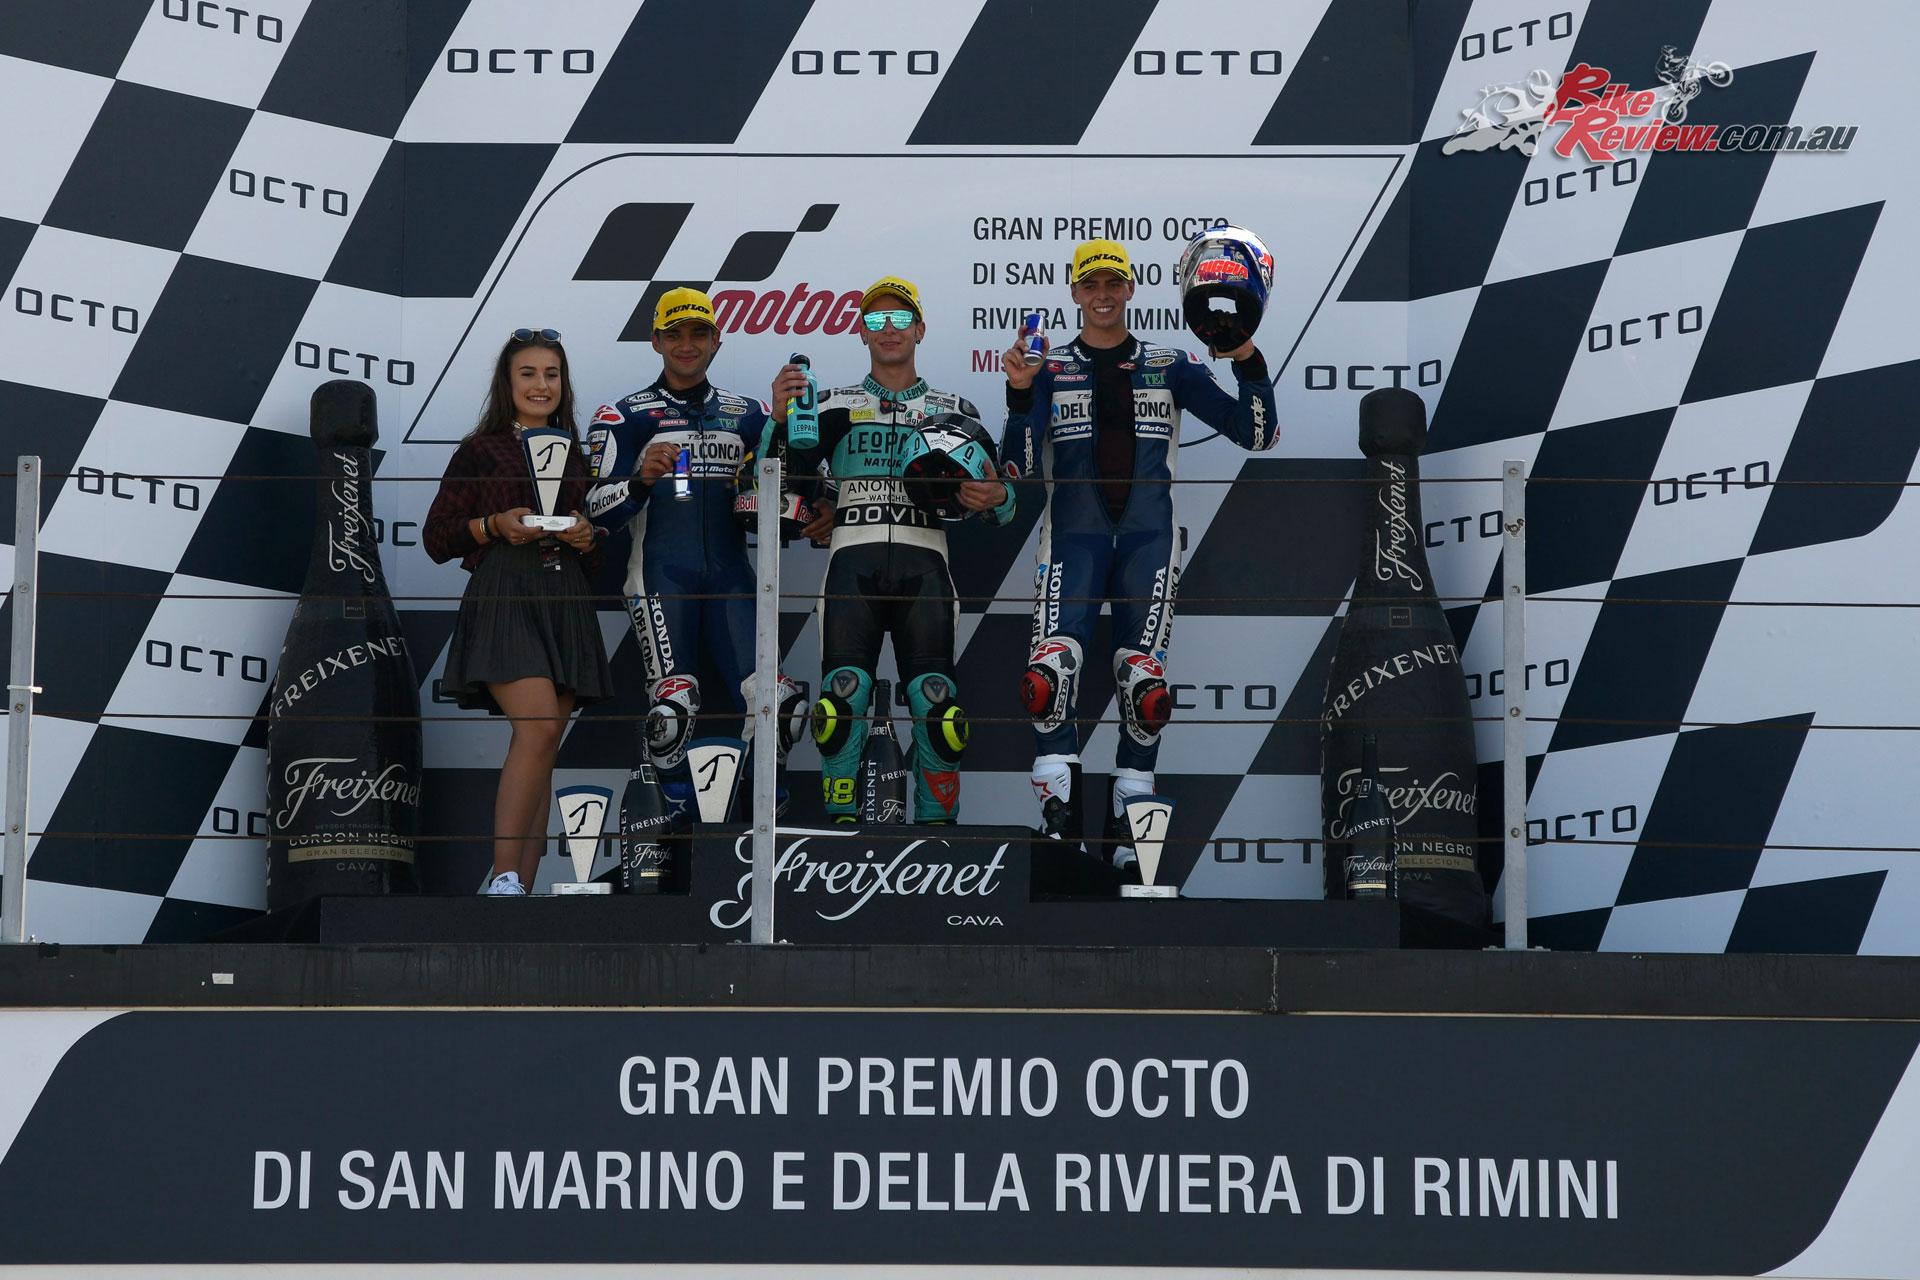 Moto3 Podium - MotoGP 2018 Misano